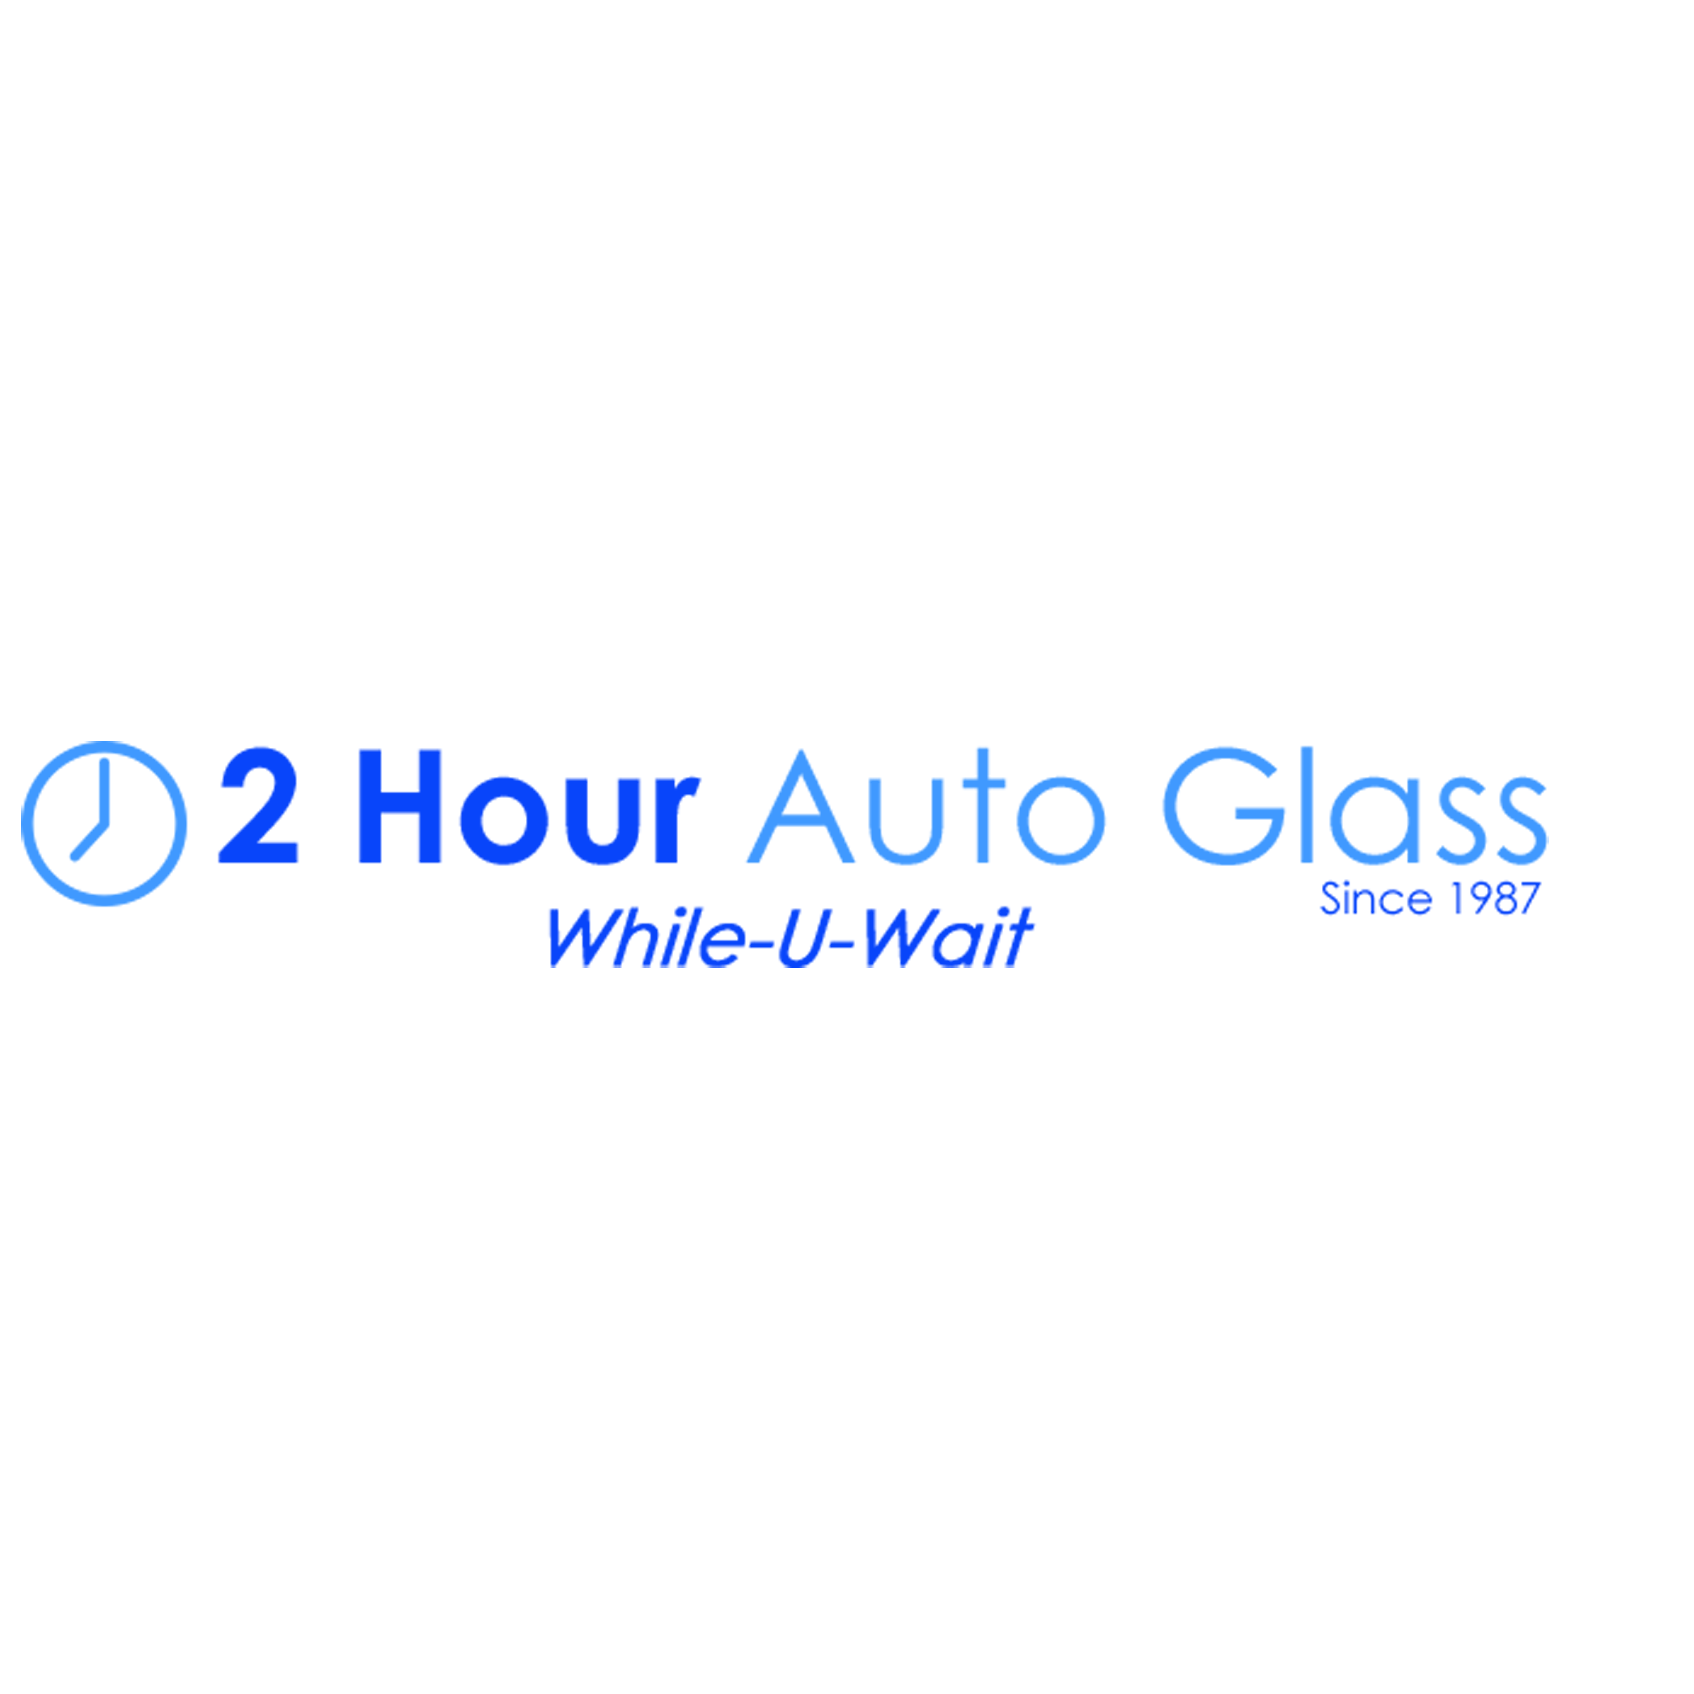 2 Hour Auto Glass